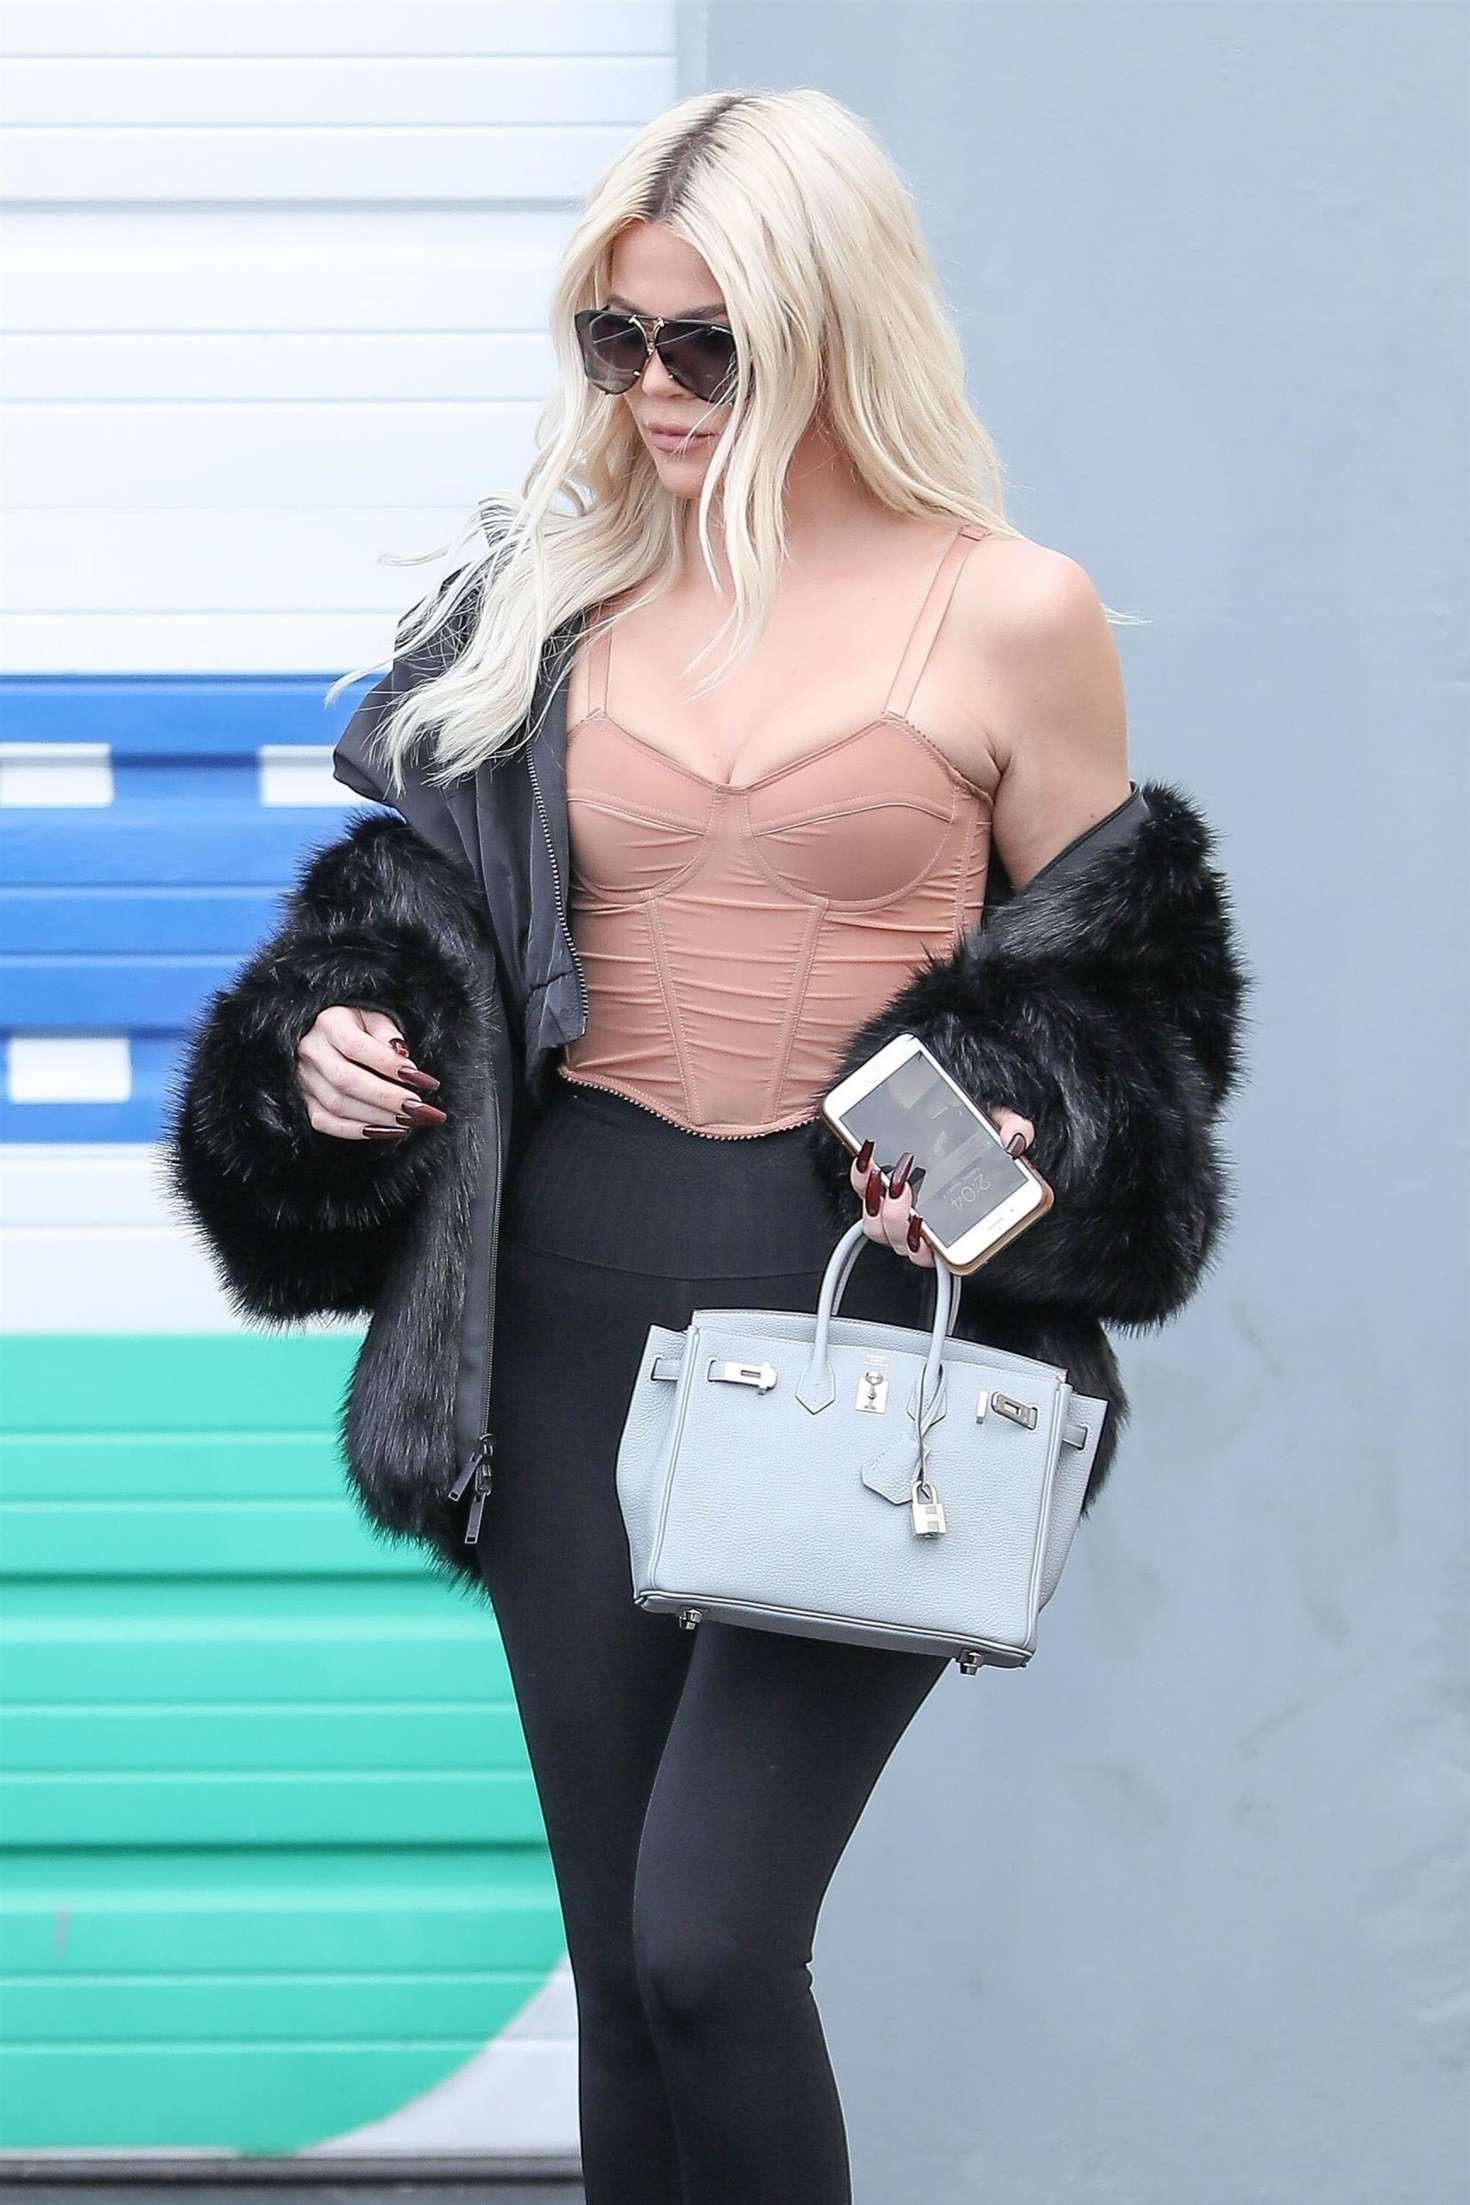 Khloe Kardashian - Leaving a studio after filming in Calabasas